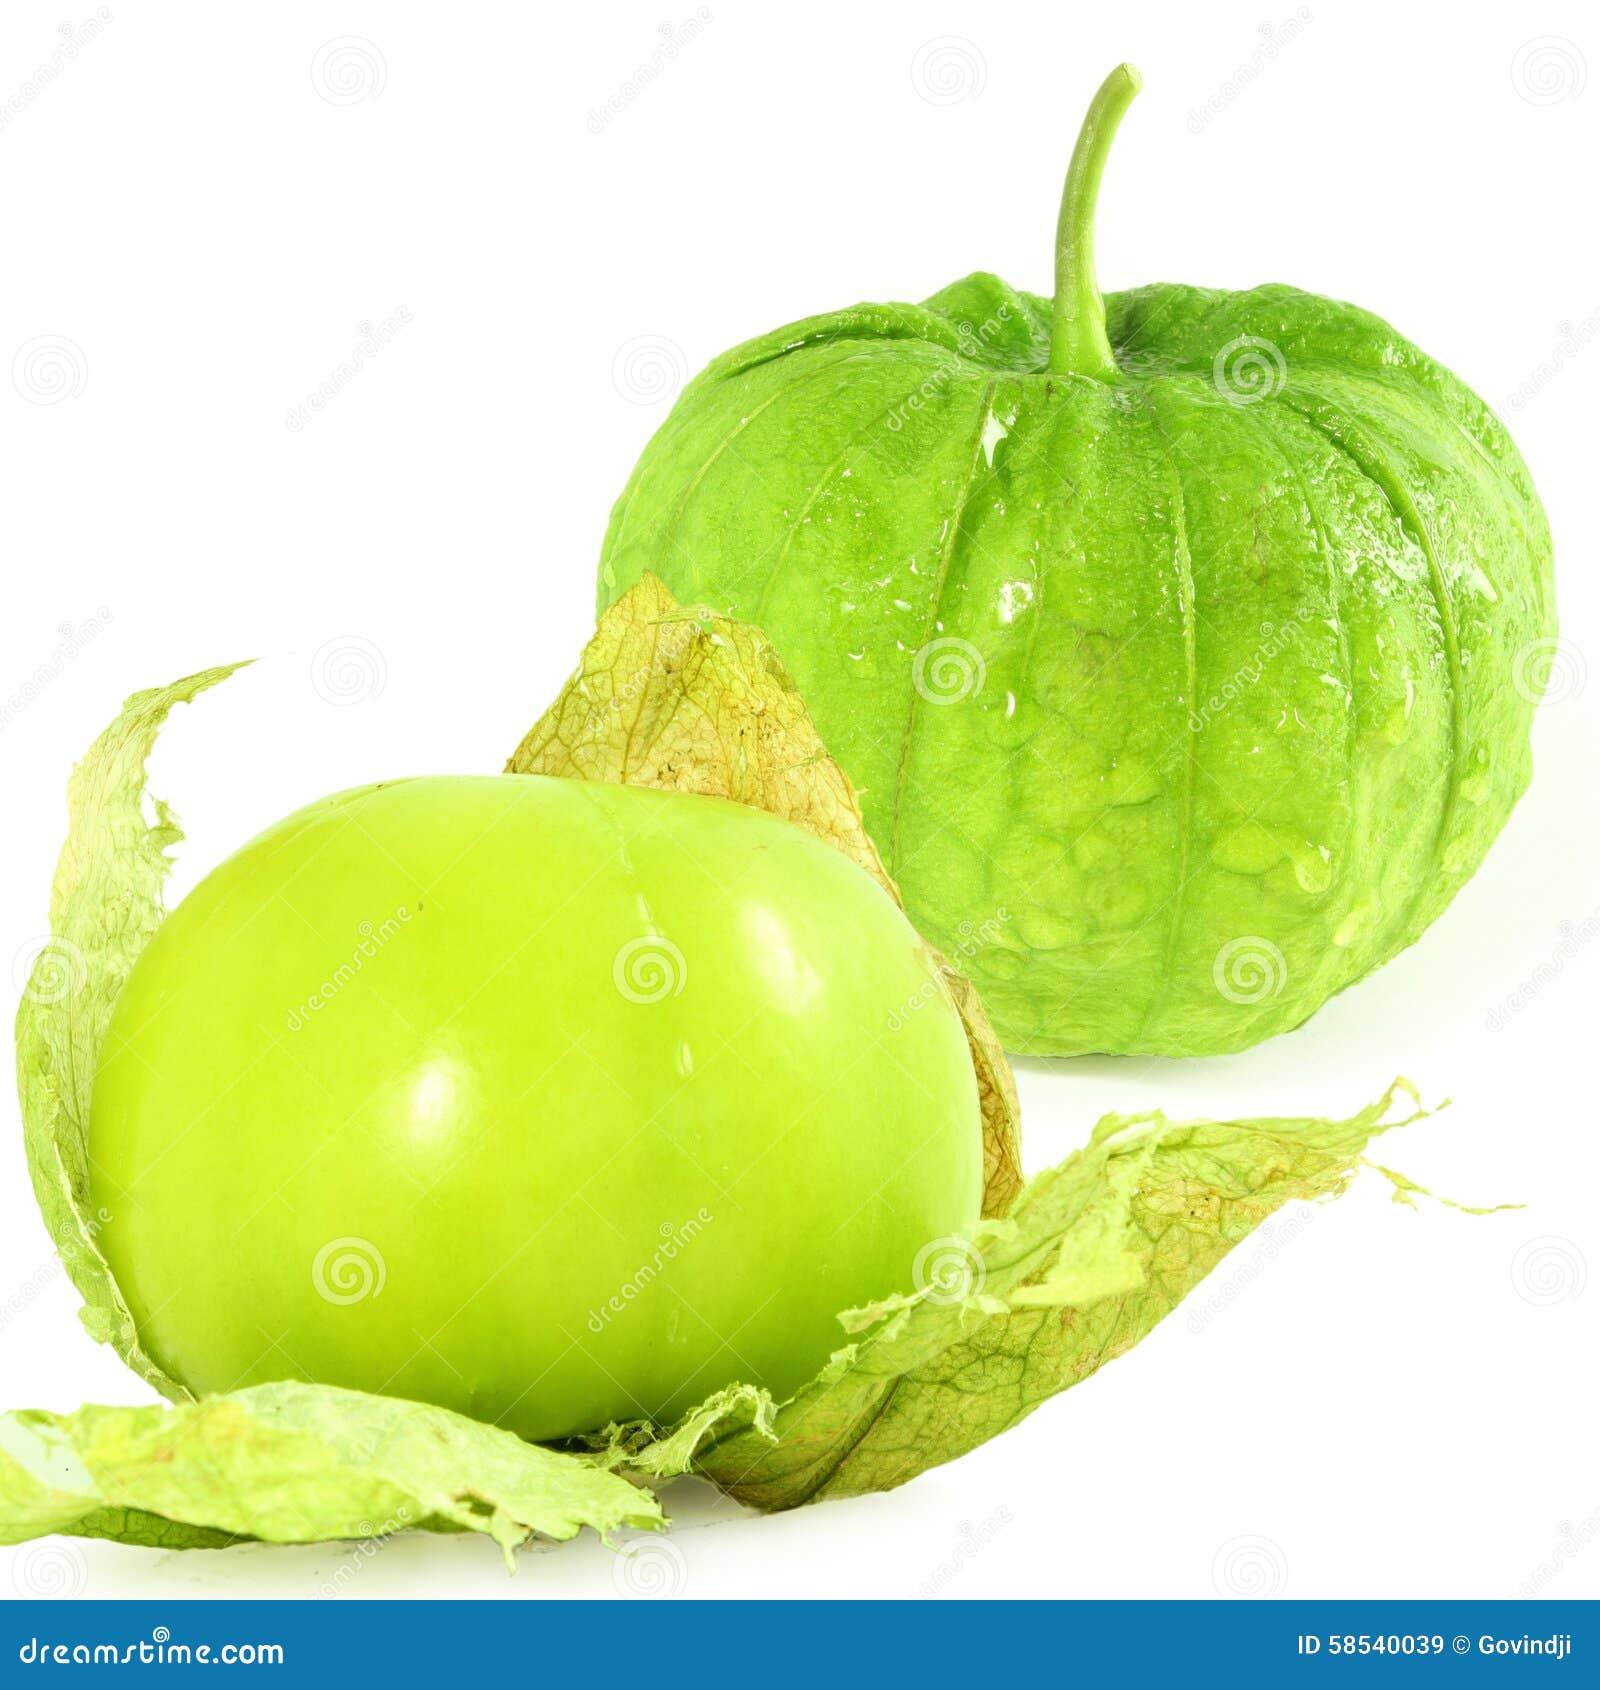 tomatillo ou fruit ou l gume vert mexicain de tomate photo stock image 58540039. Black Bedroom Furniture Sets. Home Design Ideas